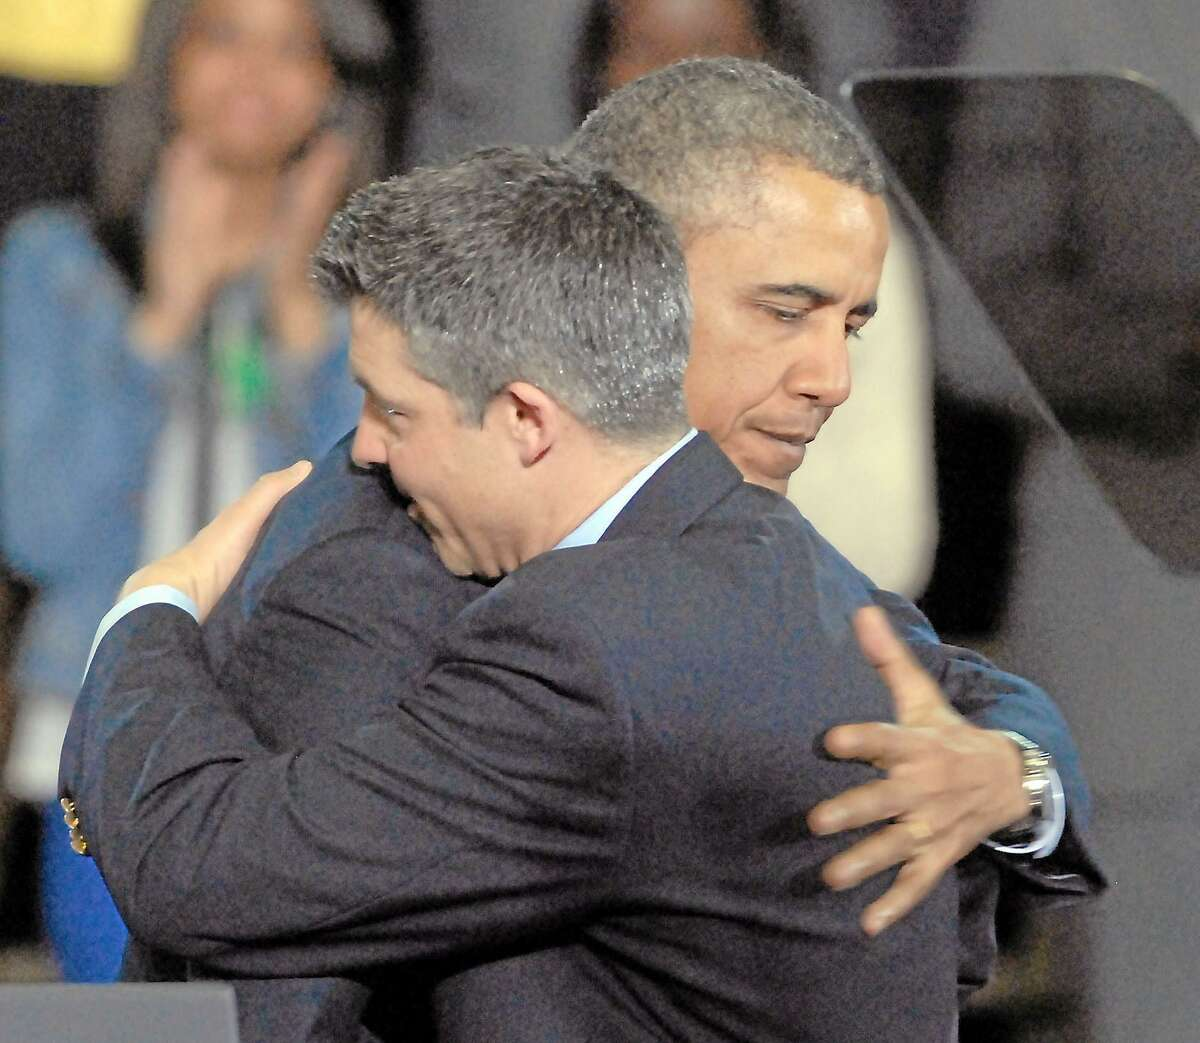 University of Hartford, West Hartford: President Barack Obama hugs Ian Hockley, father of Dylan, before Obama was to speak on gun control. Mara Lavitt/New Haven Register ¬ ¬ 4/8/13